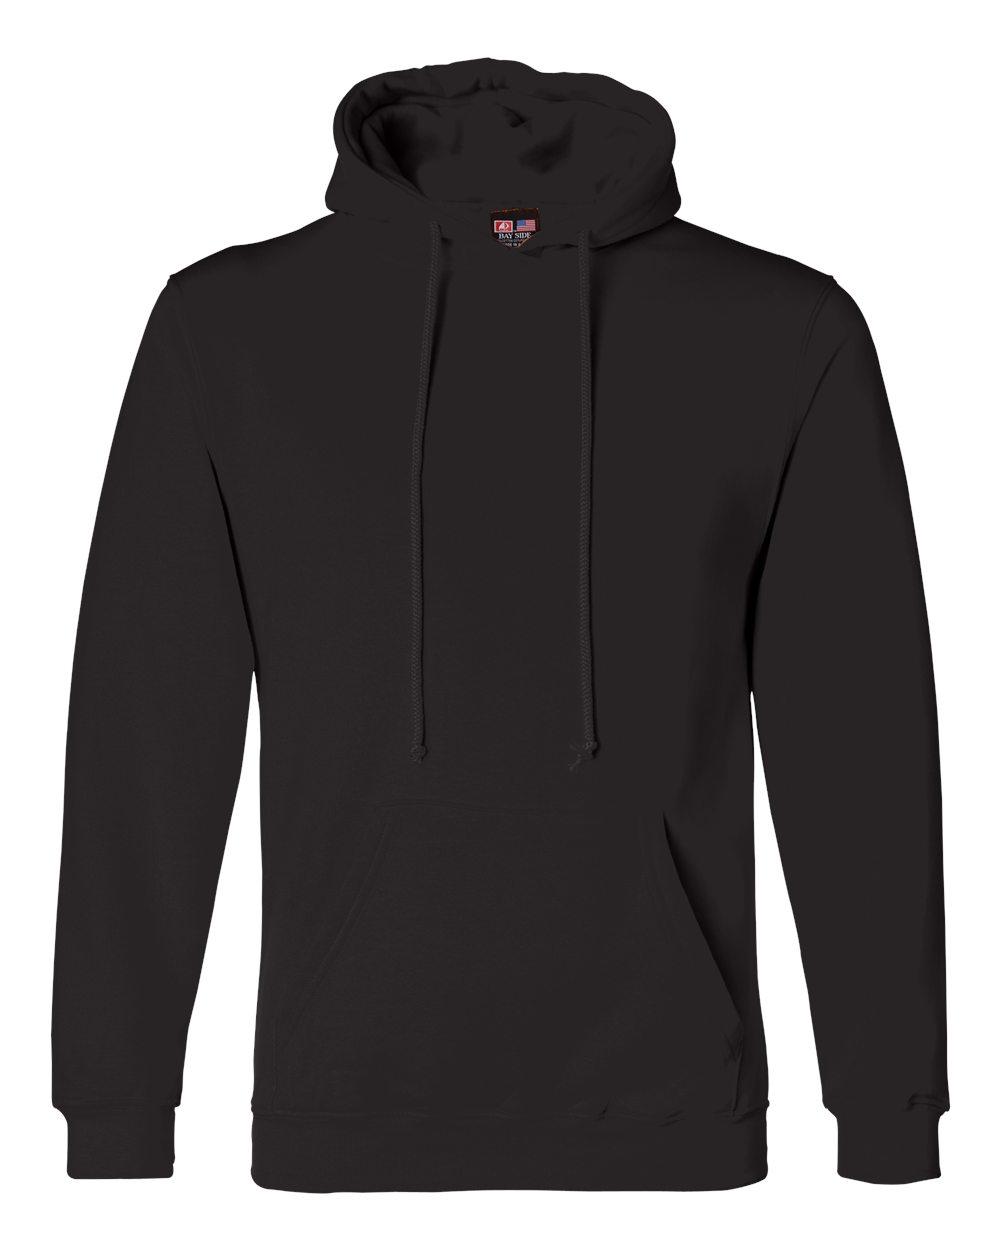 Bayside-Mens-Blank-USA-Made-Hooded-Sweatshirt-960-up-to-6XL miniature 6